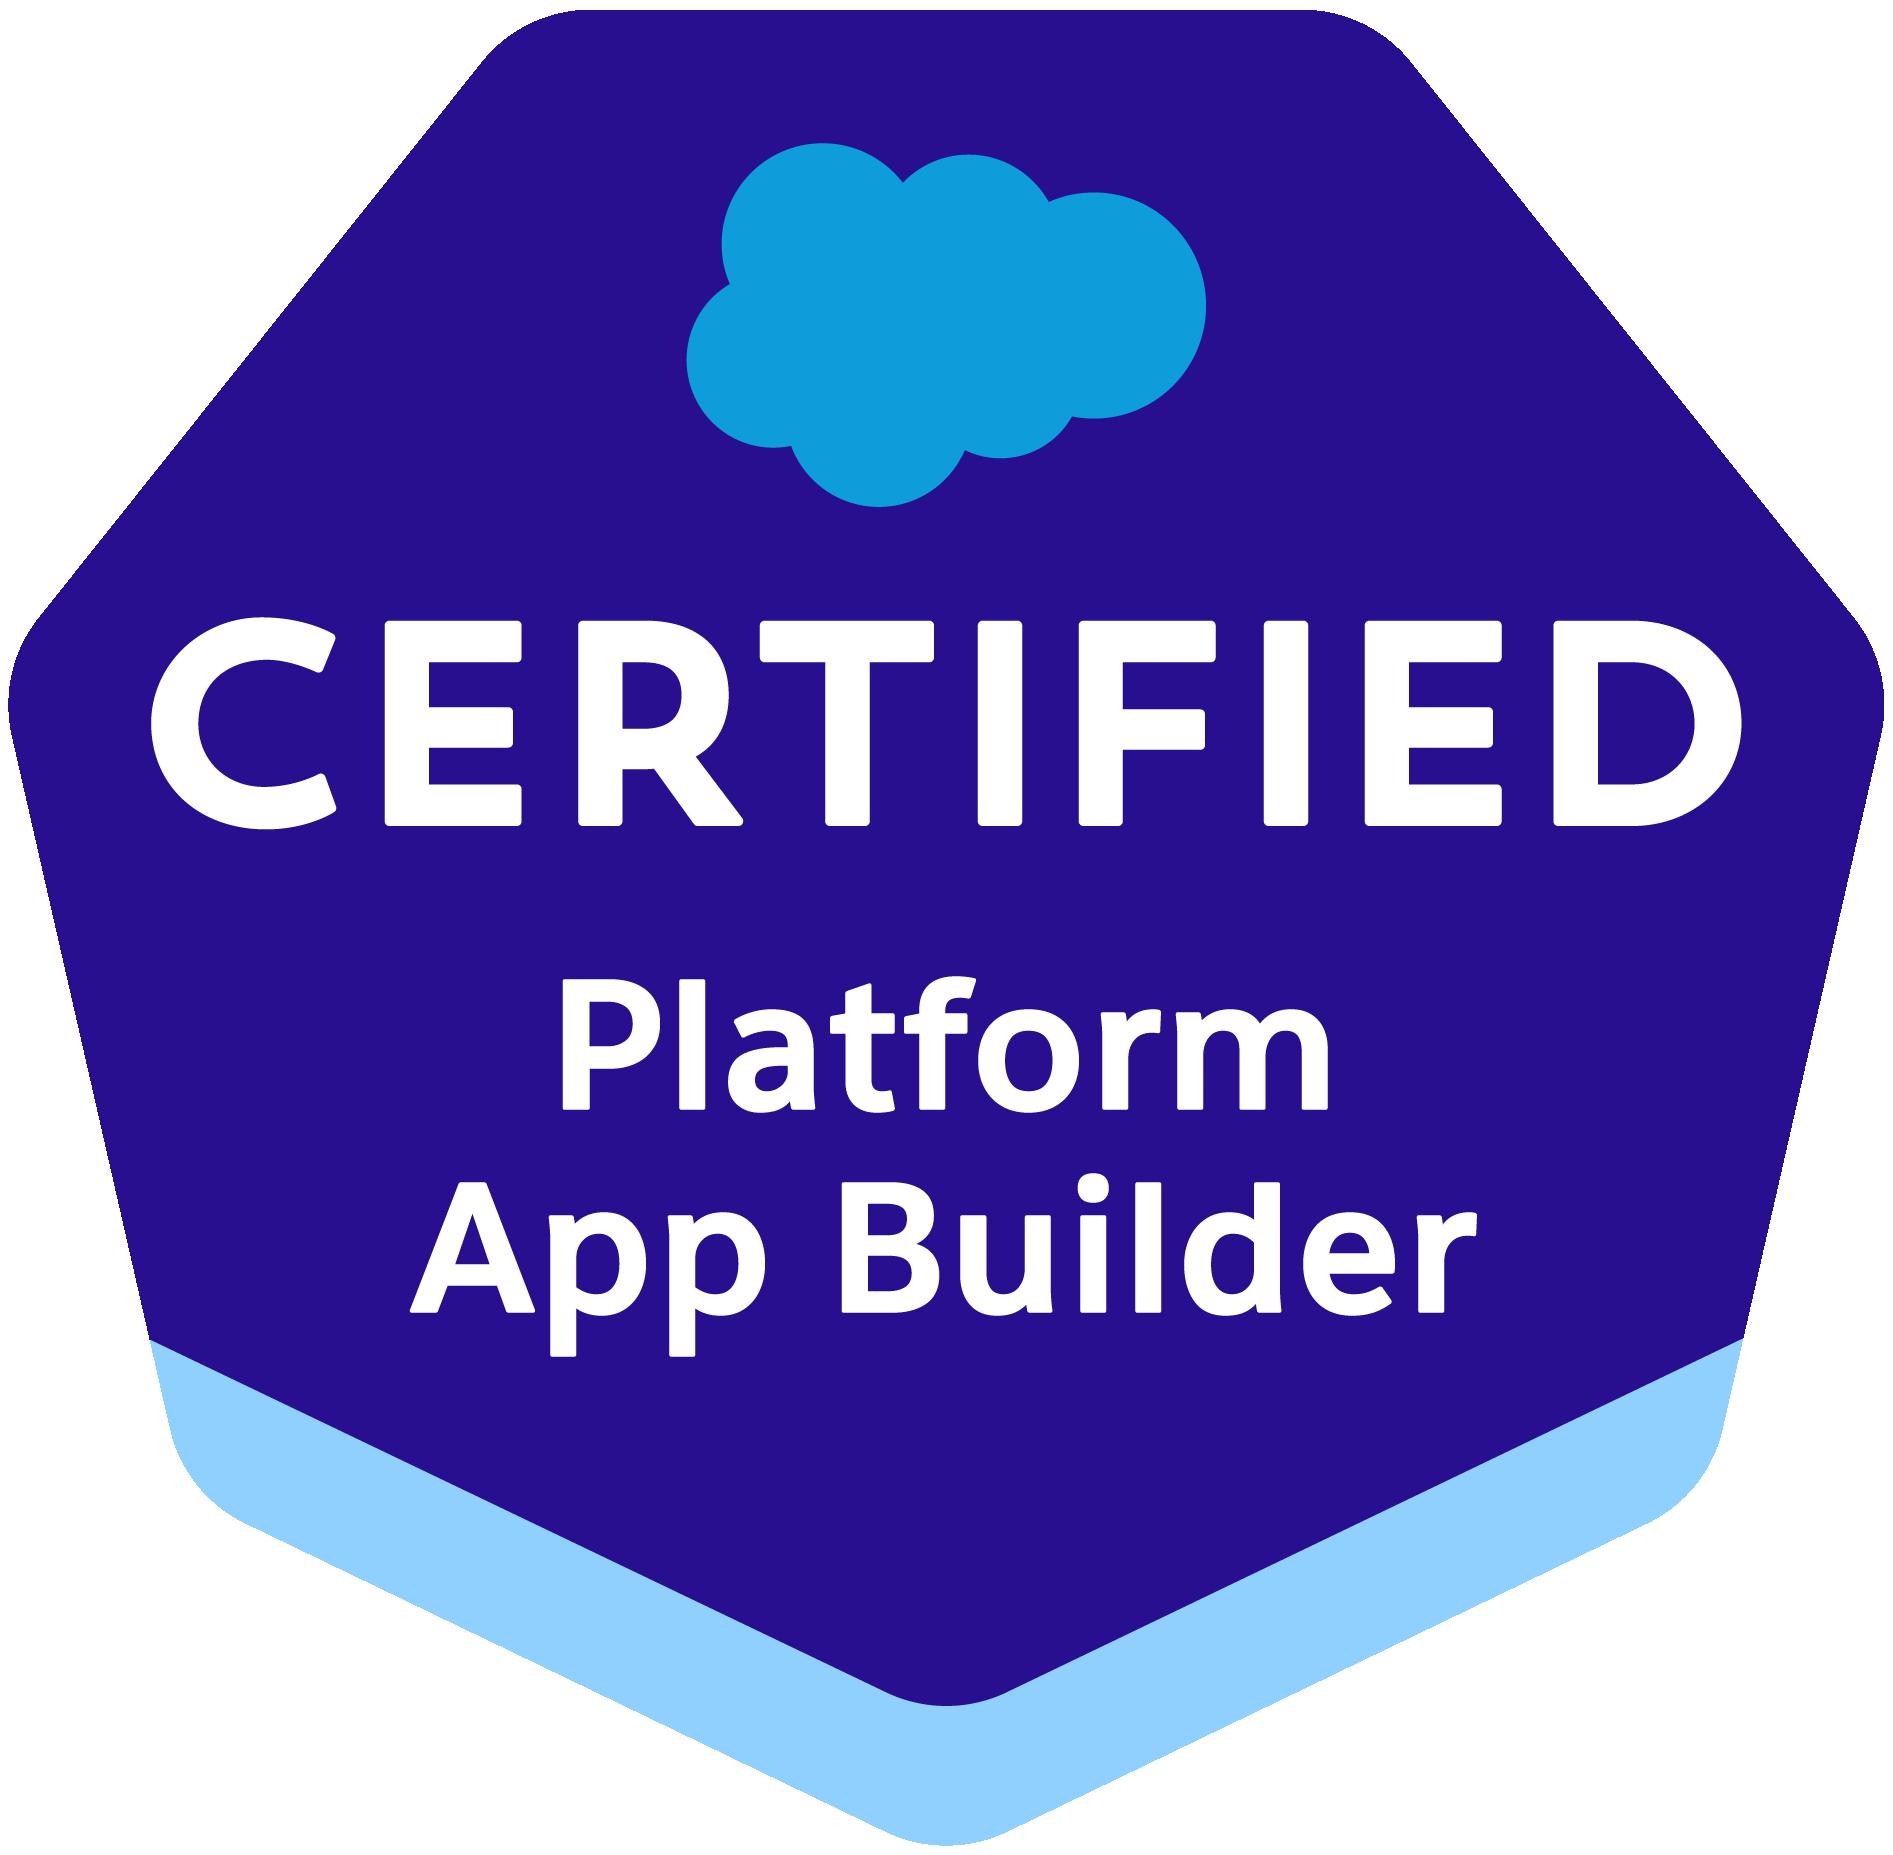 Platform App Builder Certification